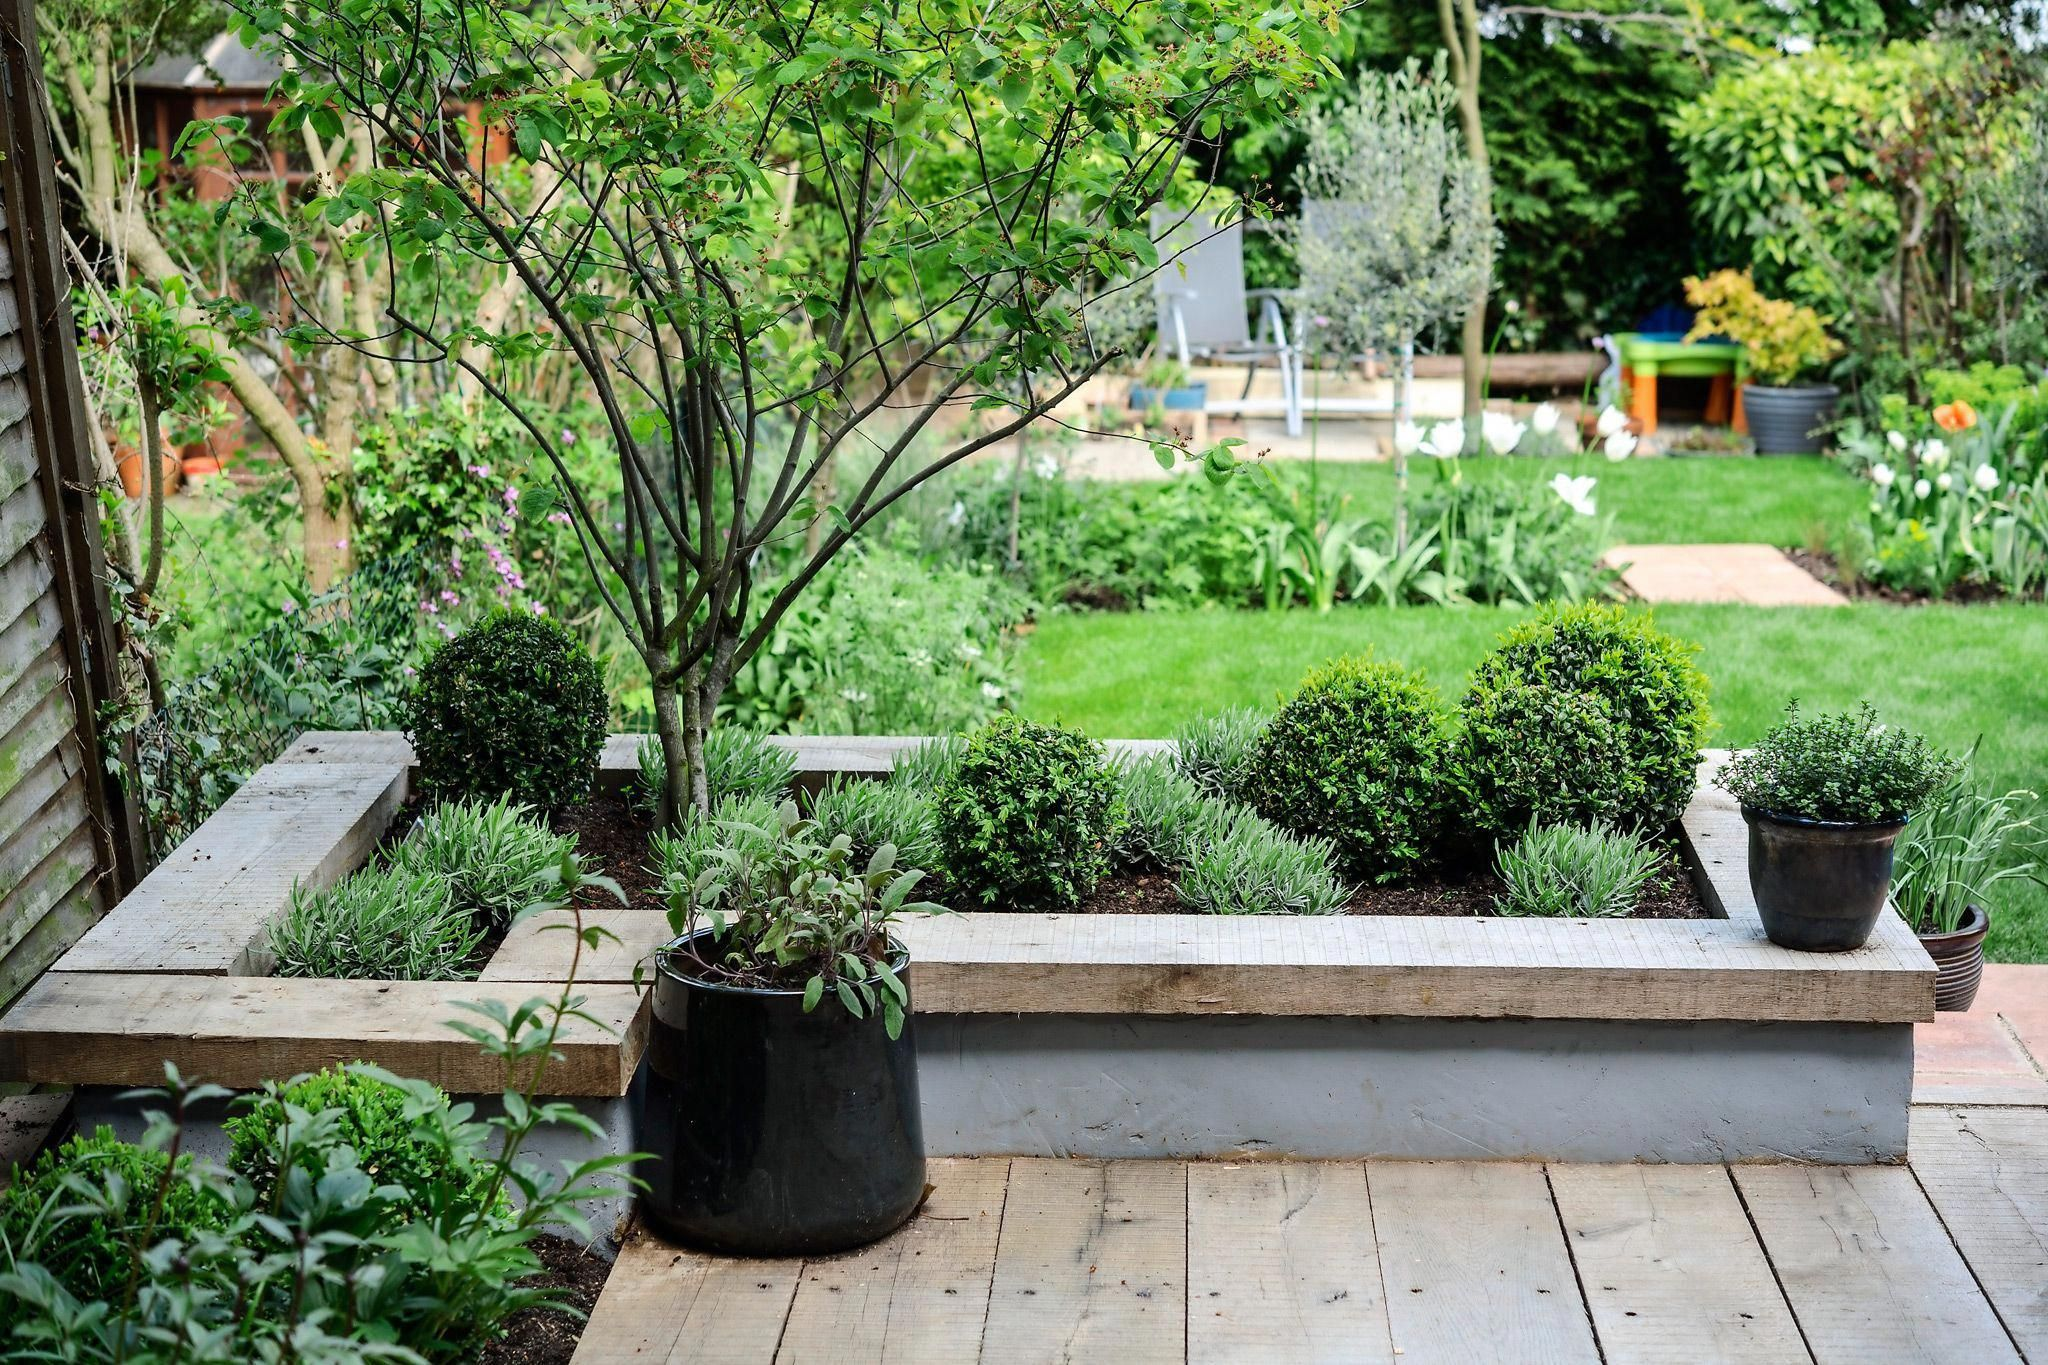 Gardeners World And Building Supplies Ltd